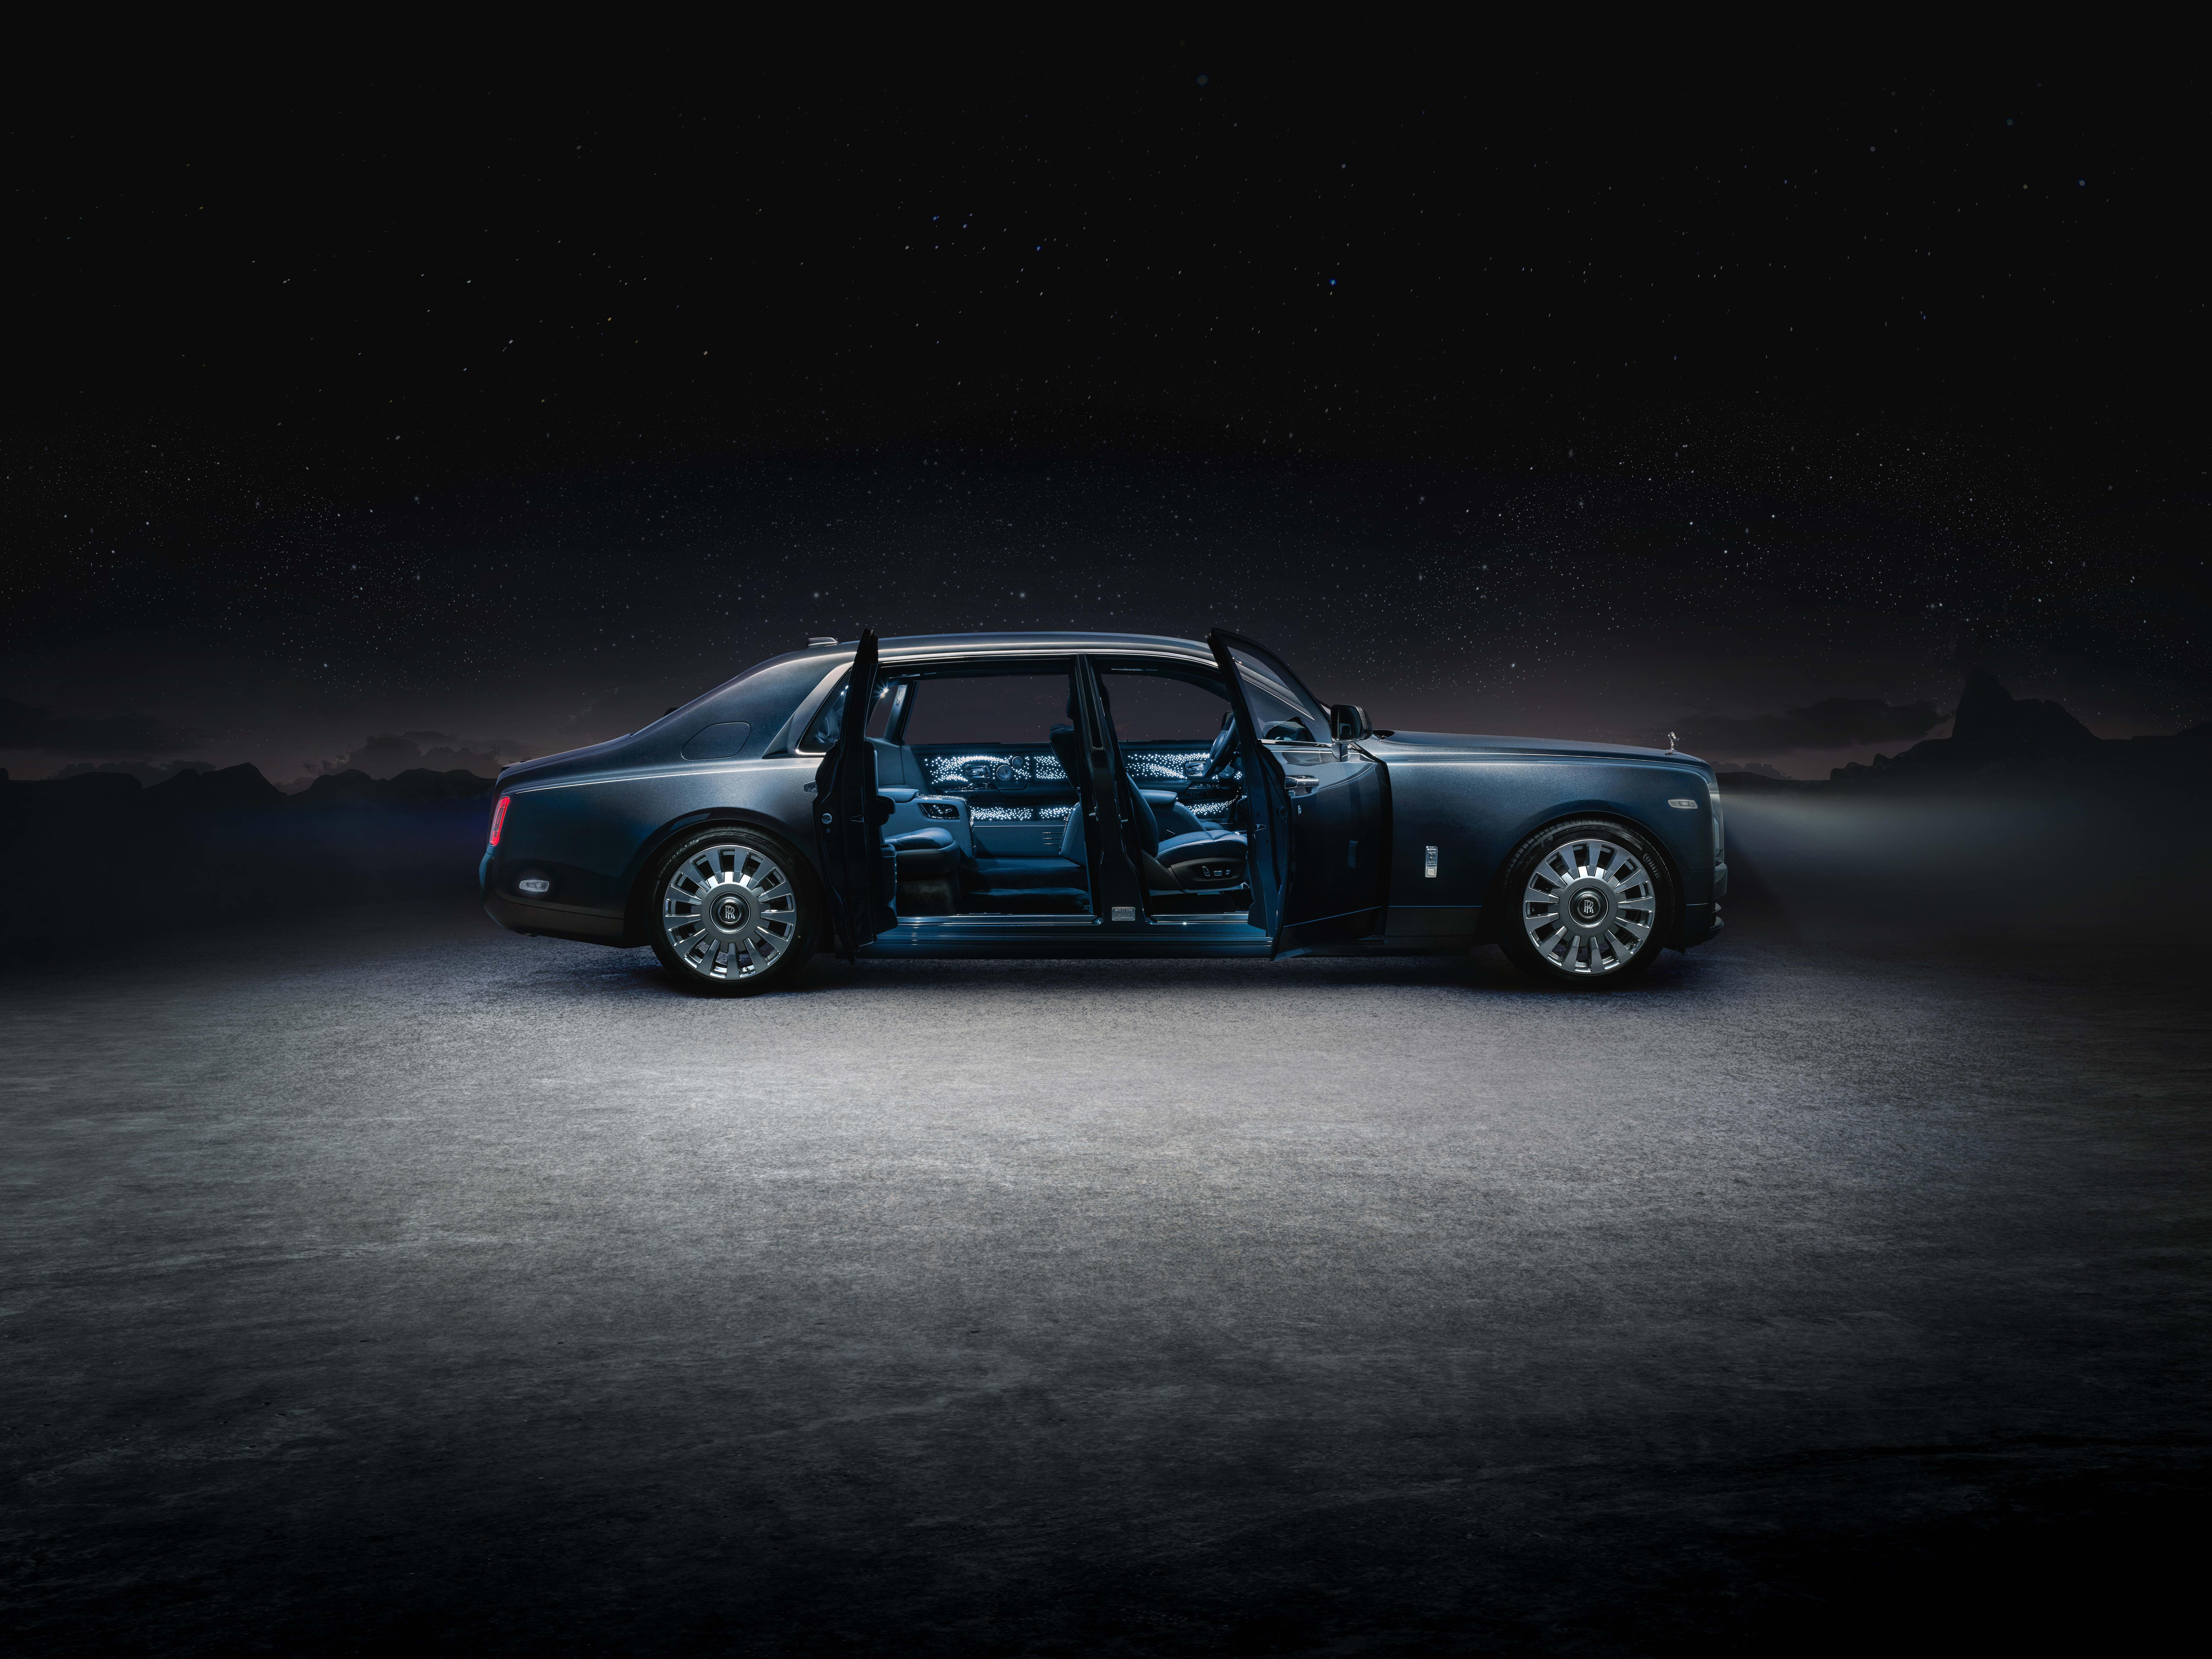 rolls royce phantom ewb tempus collection 2021 side view 4k 1618919473 - Rolls Royce Phantom EWB Tempus Collection 2021 Side View 4k - Rolls Royce Phantom EWB Tempus Collection 2021 Side View 4k wallpapers